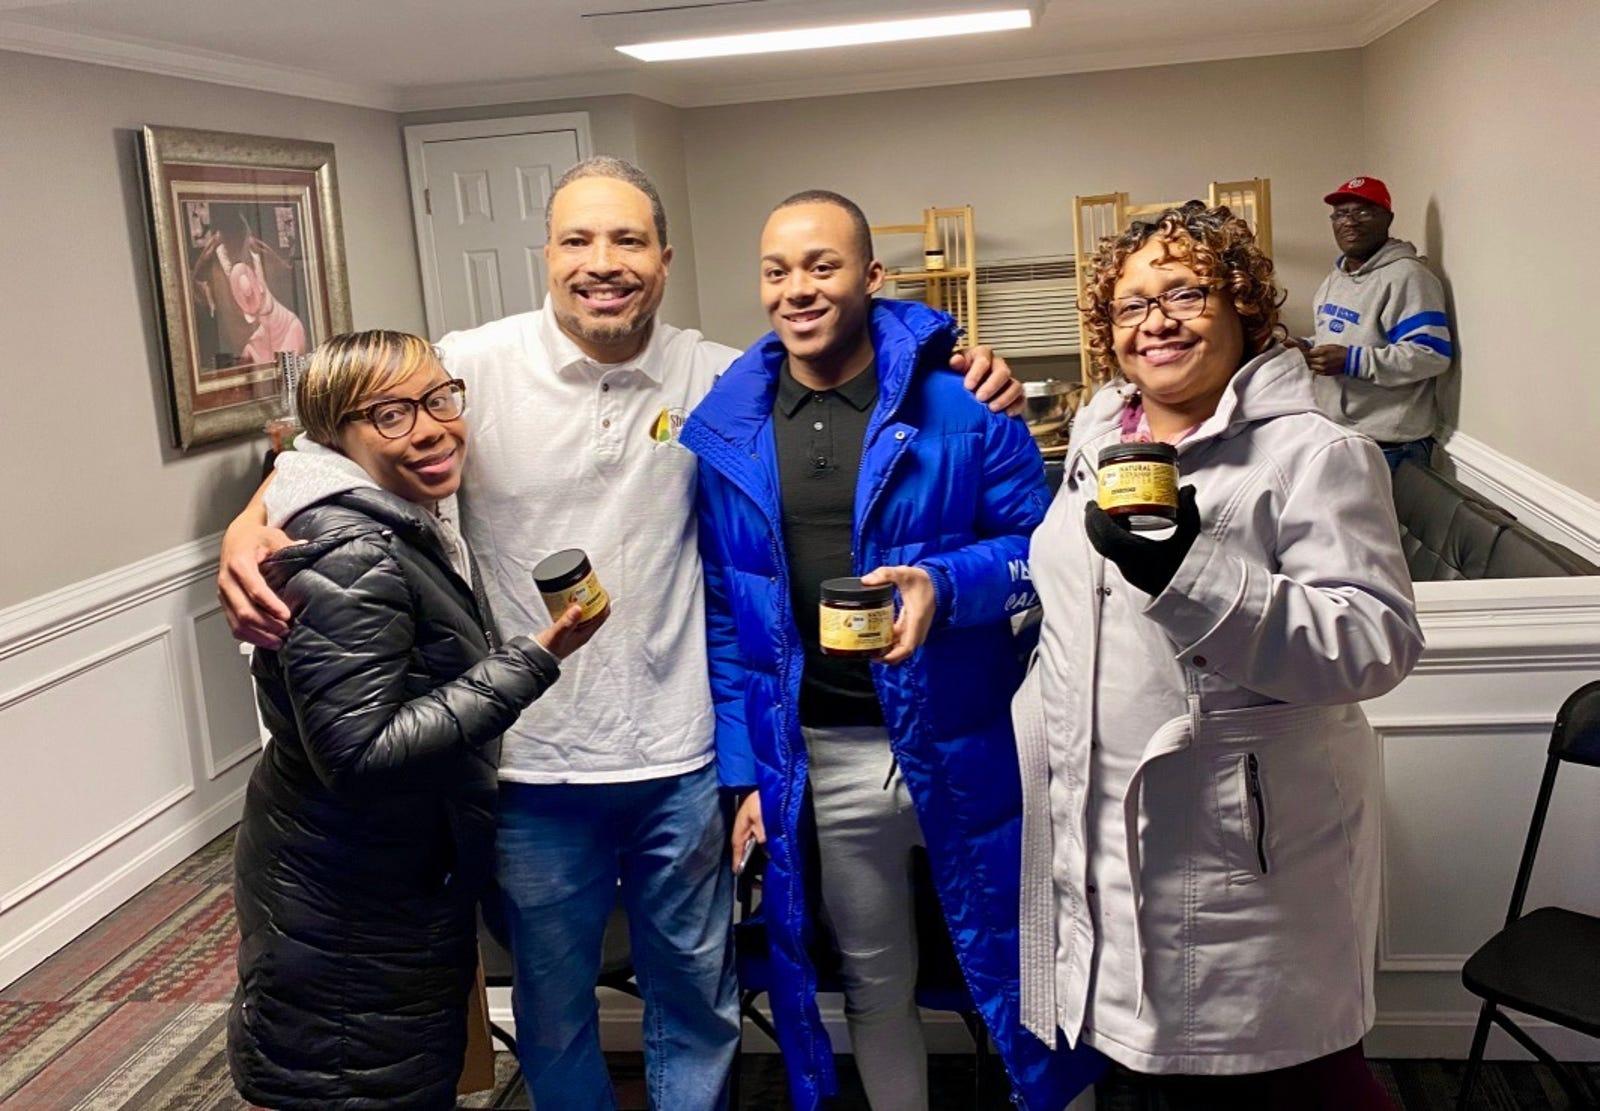 Terry Williams with the Patrice Family, including Ebony, Karon and Vera.